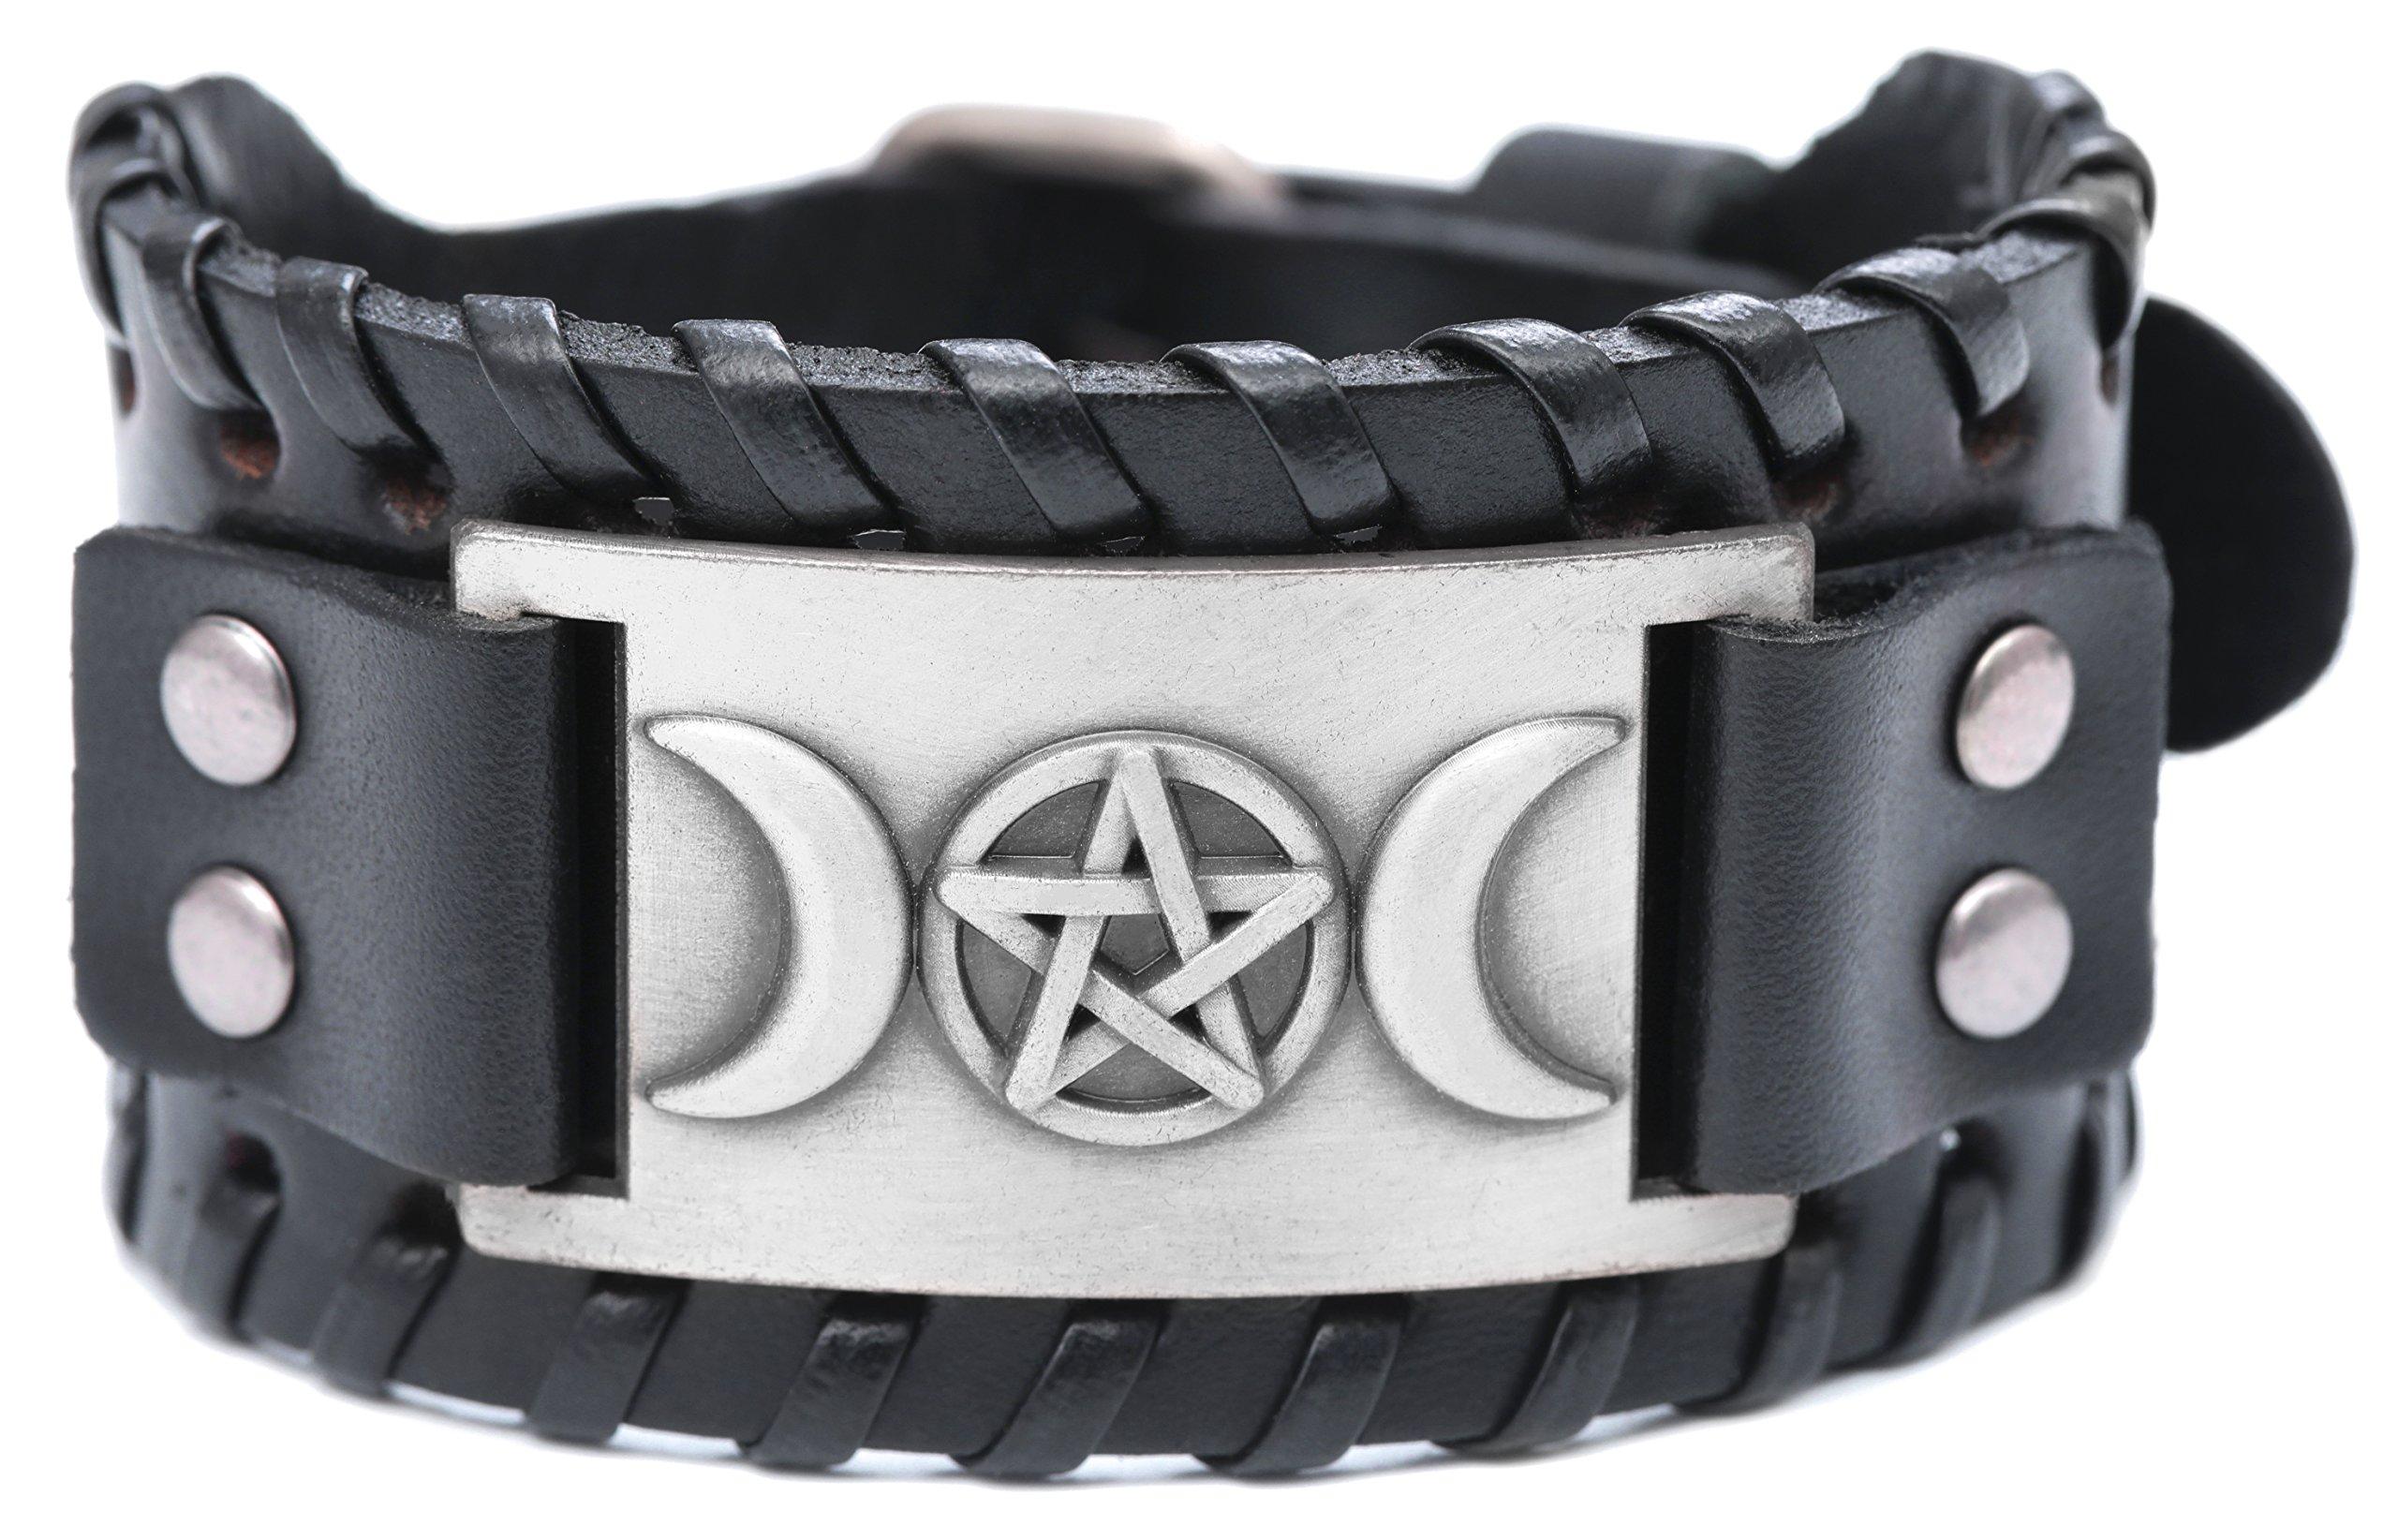 VASSAGO Vintage Pagan Triple Moon Goddess Pentacle Pentagram Metal Amulet Cuff New-style Leather Bracelet (Black Leather, Antique Silver)